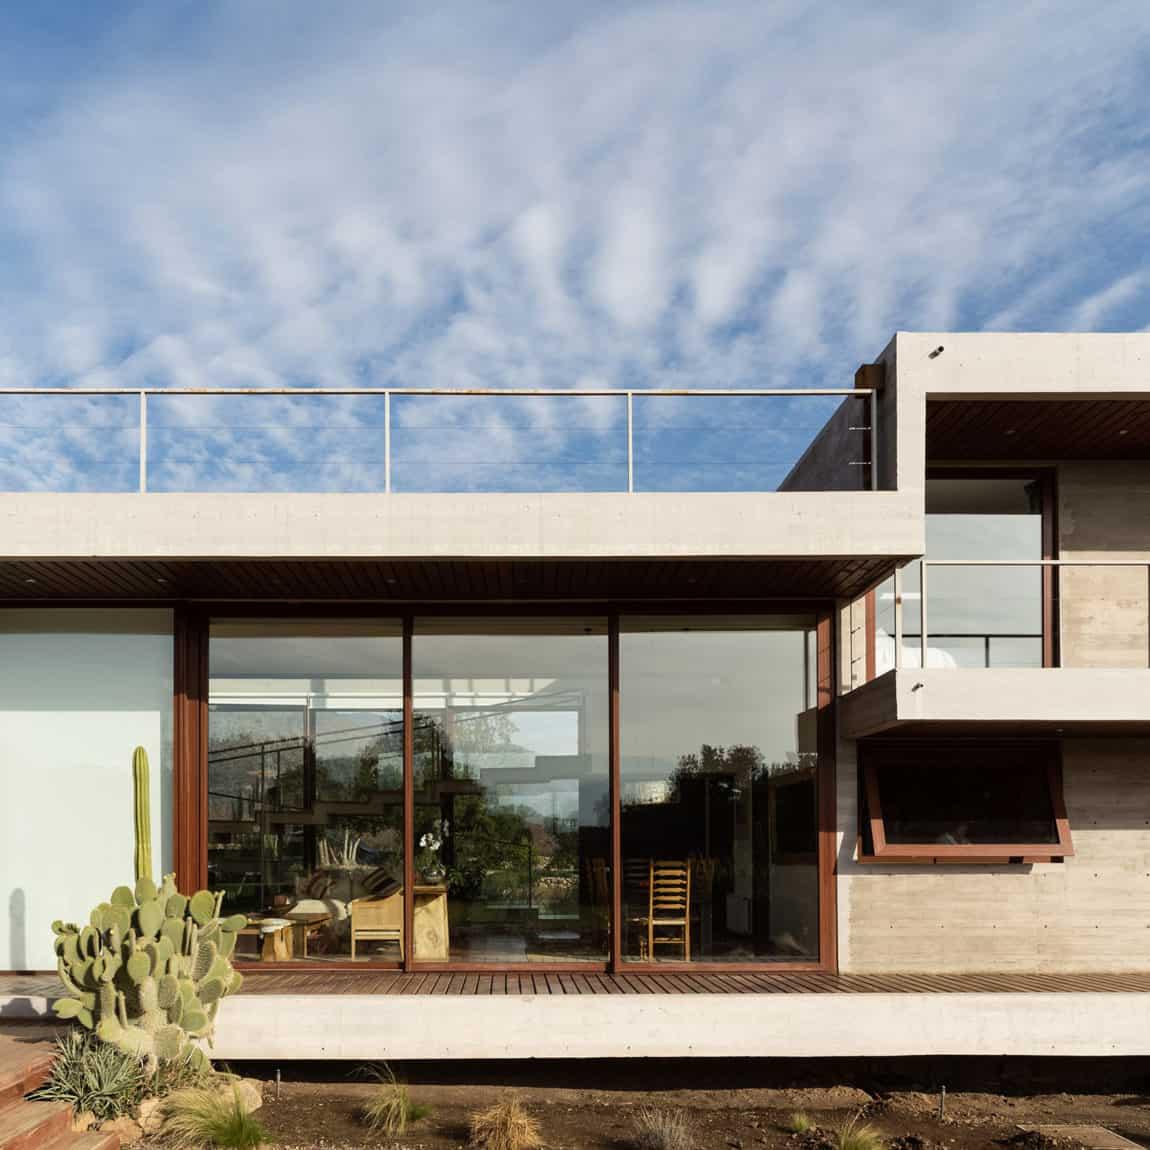 Casa Corredor by Chauriye Stäger Arquitectos (6)